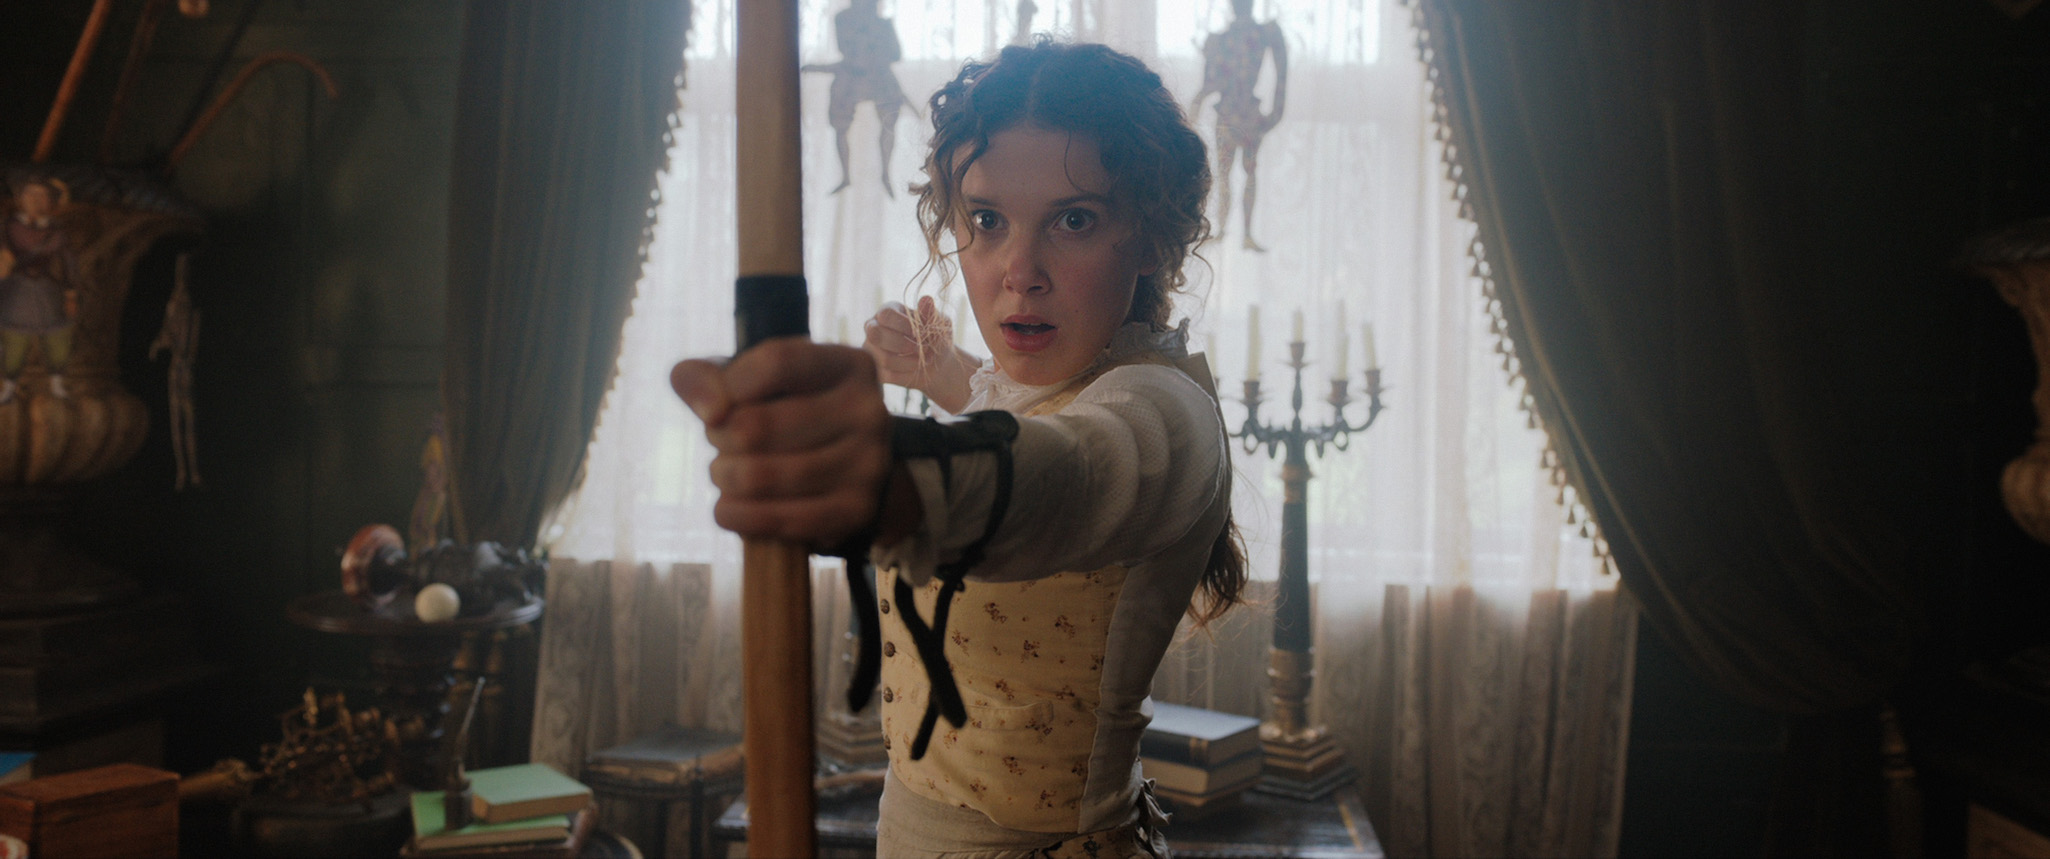 Millie Bobby Brown se convierte en la hermana de Sherlock Holmes en la próxima película de Netflix